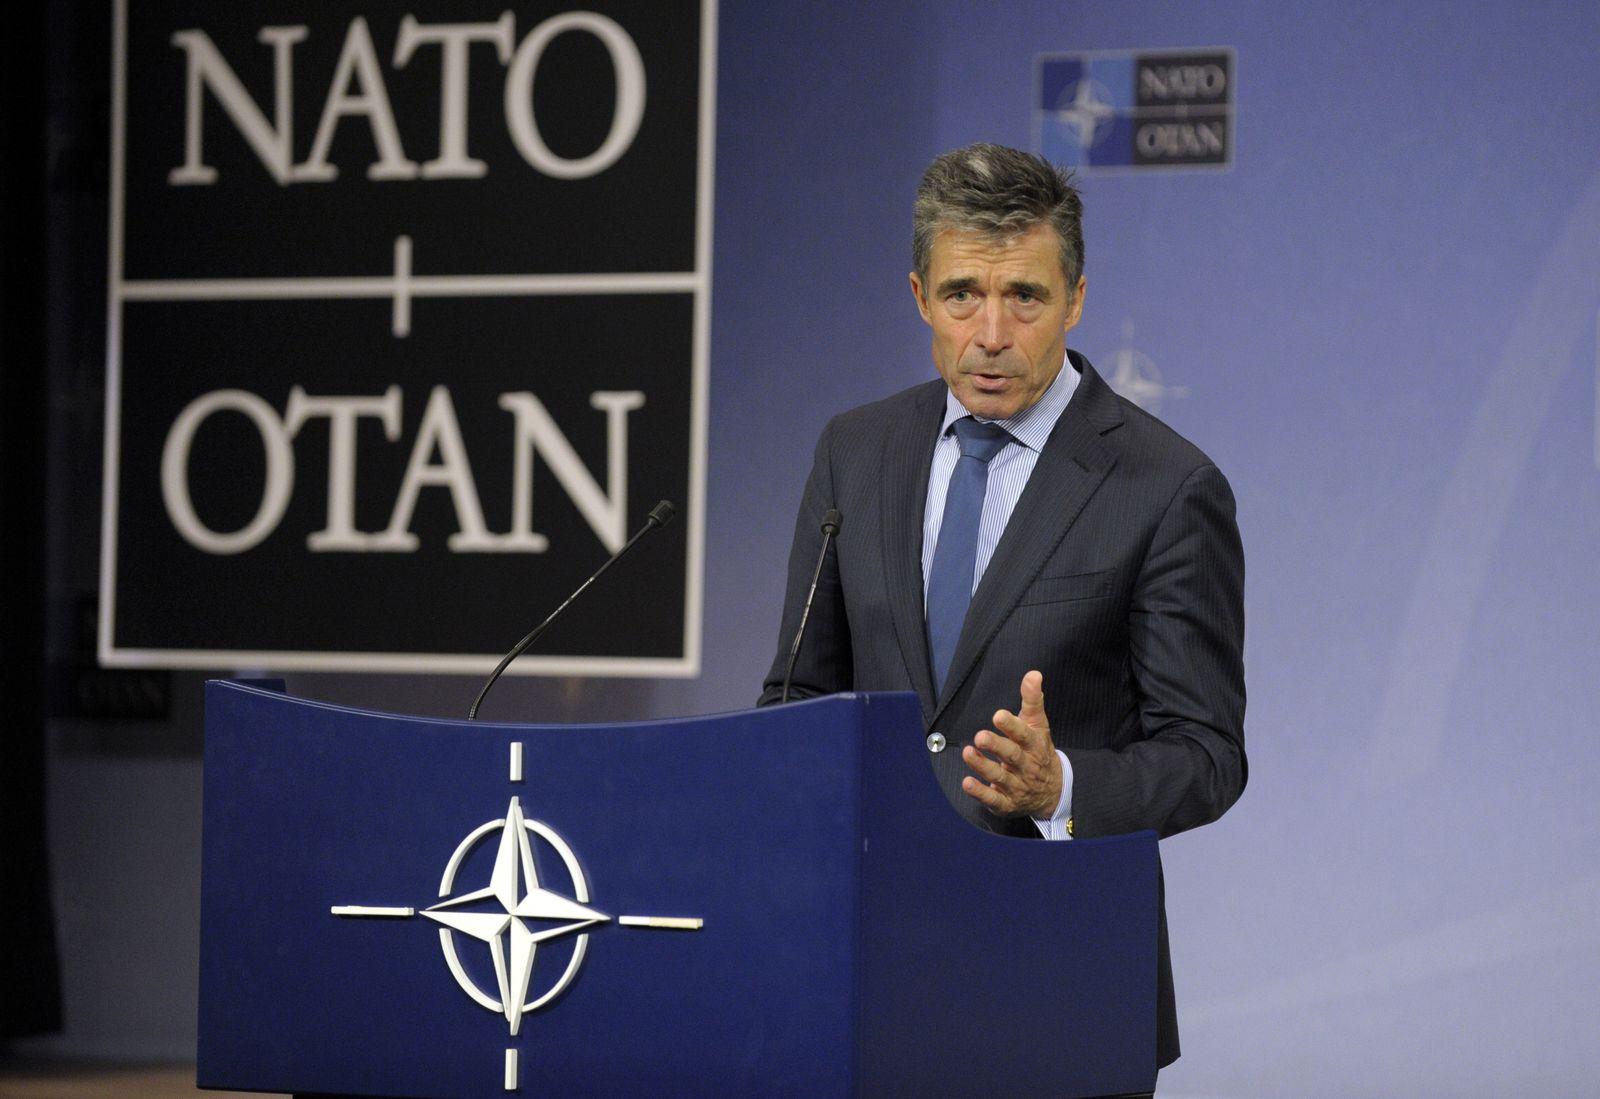 Anders Fogh Rasmussen/ Nato